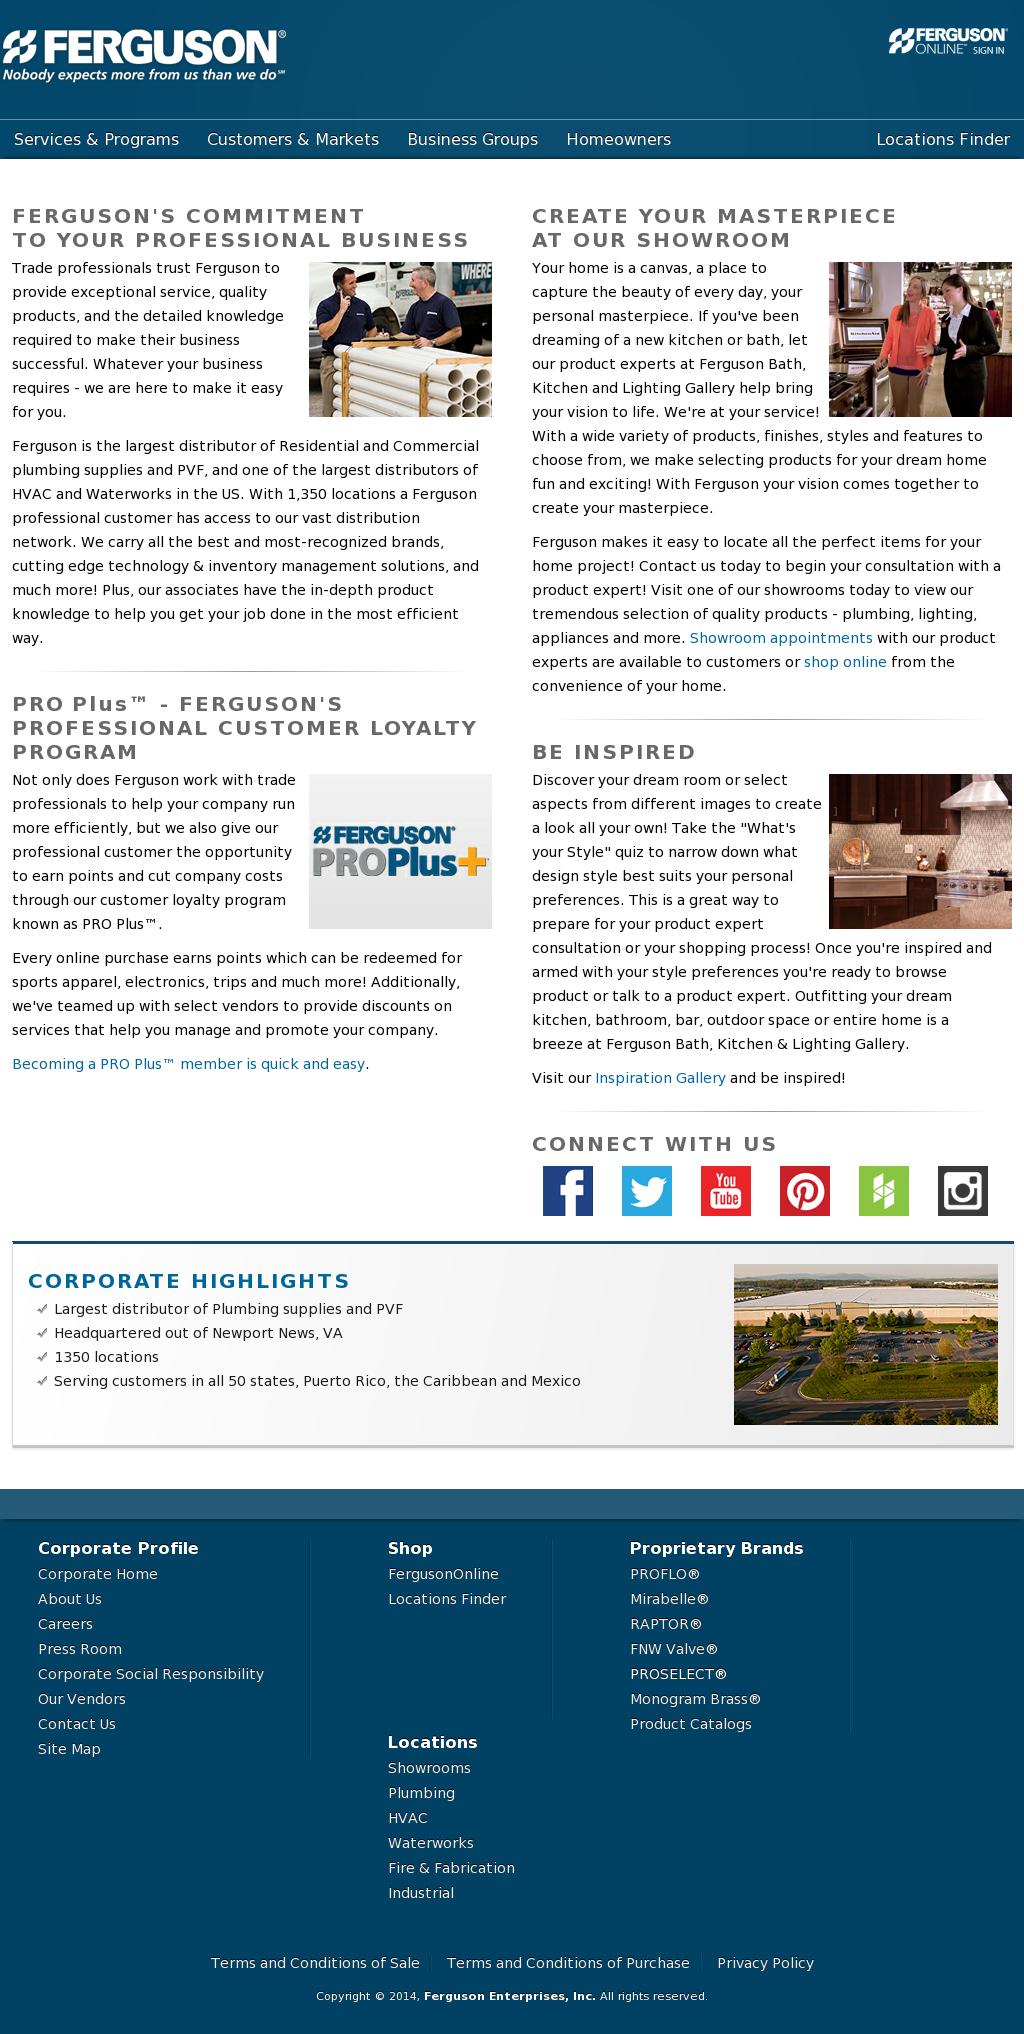 Ferguson Enterprises Competitors, Revenue and Employees - Owler ...